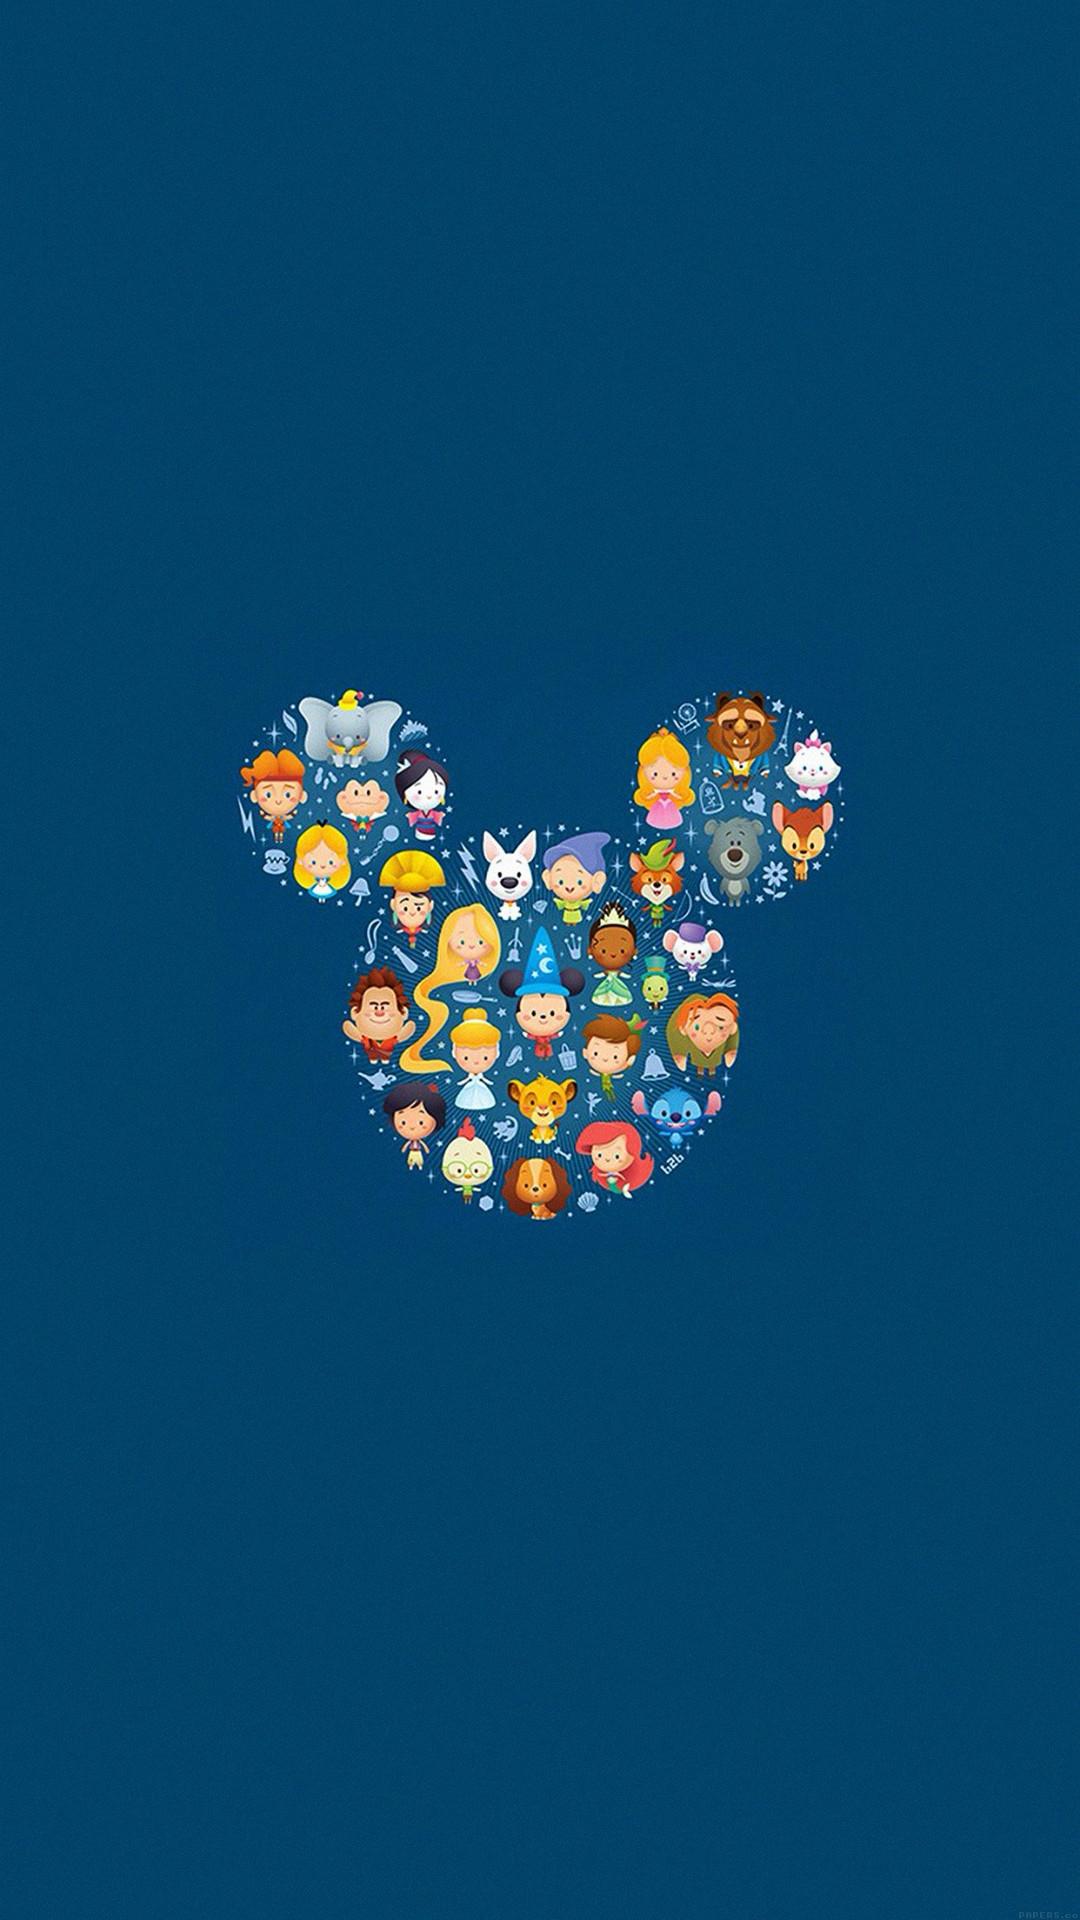 Free Download Disney Art Character Cute Illust Iphone 66s7 Plus